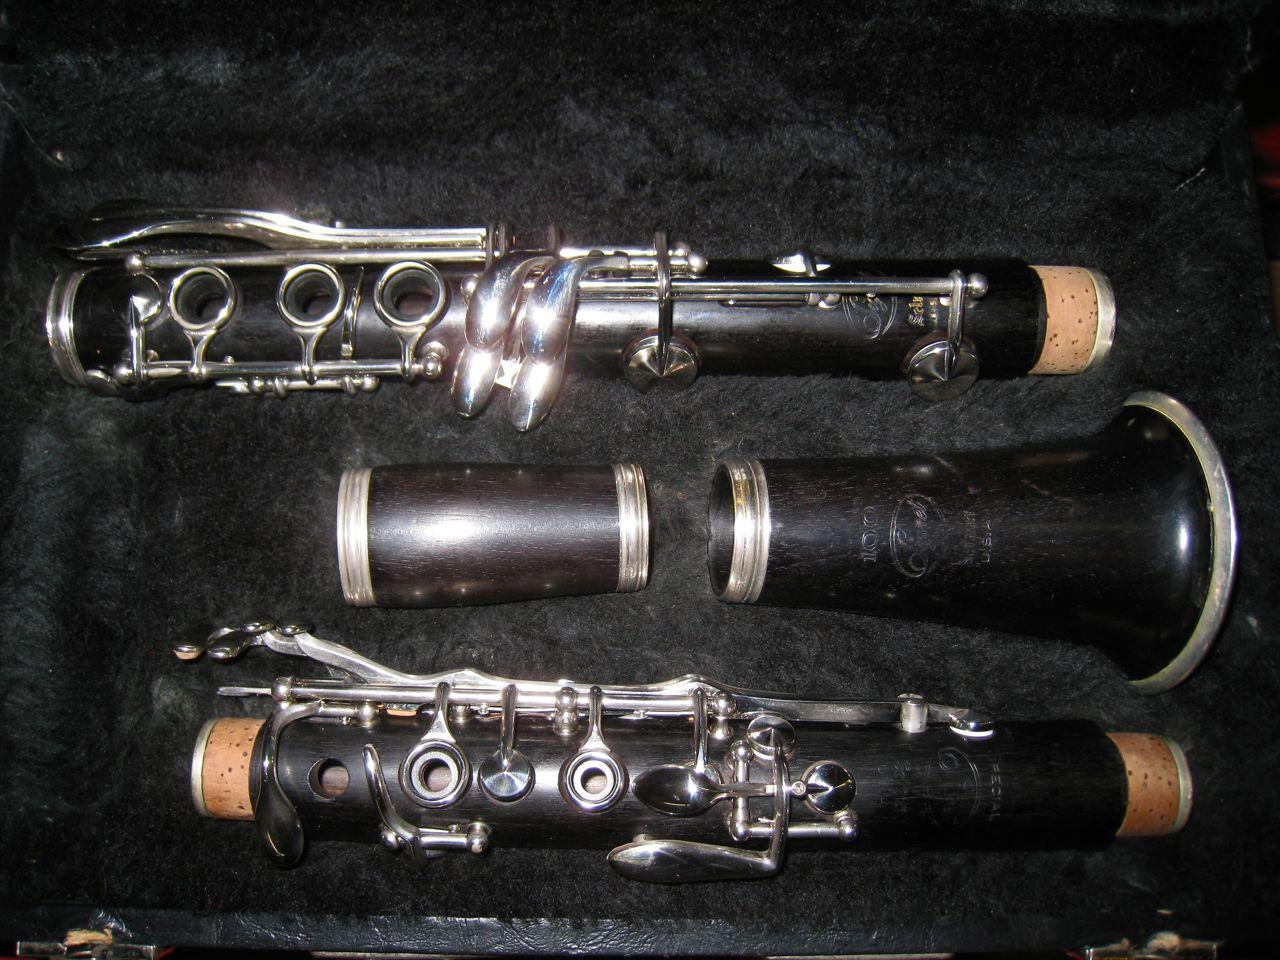 Selmer clarinet serial numbers  Selmer USA Clarinet  2019-06-03